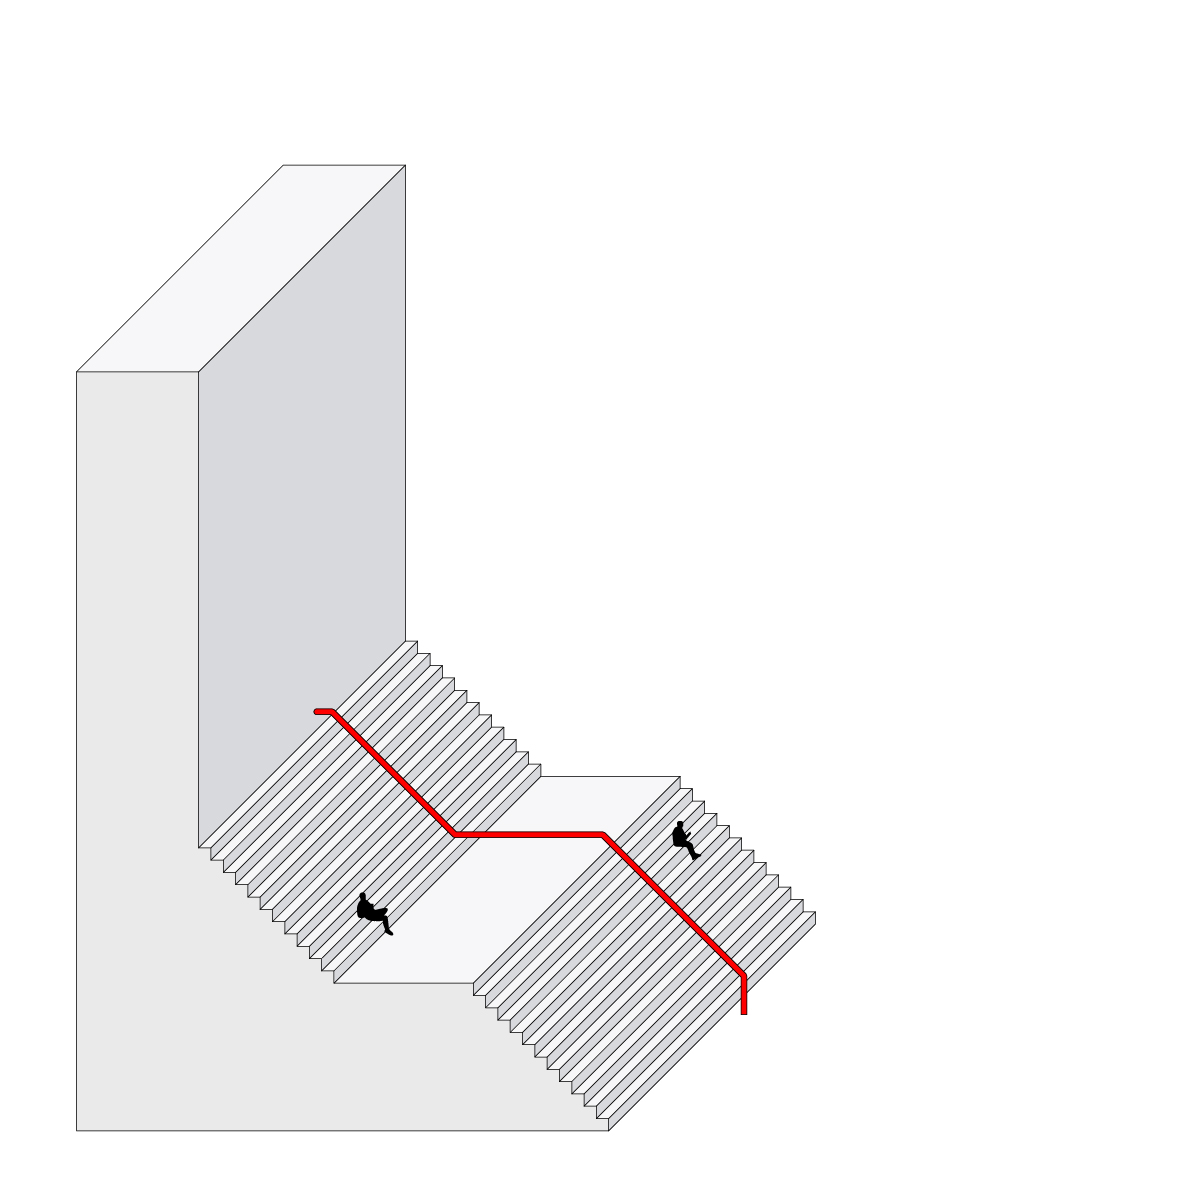 operatorband_no_text_1.jpg